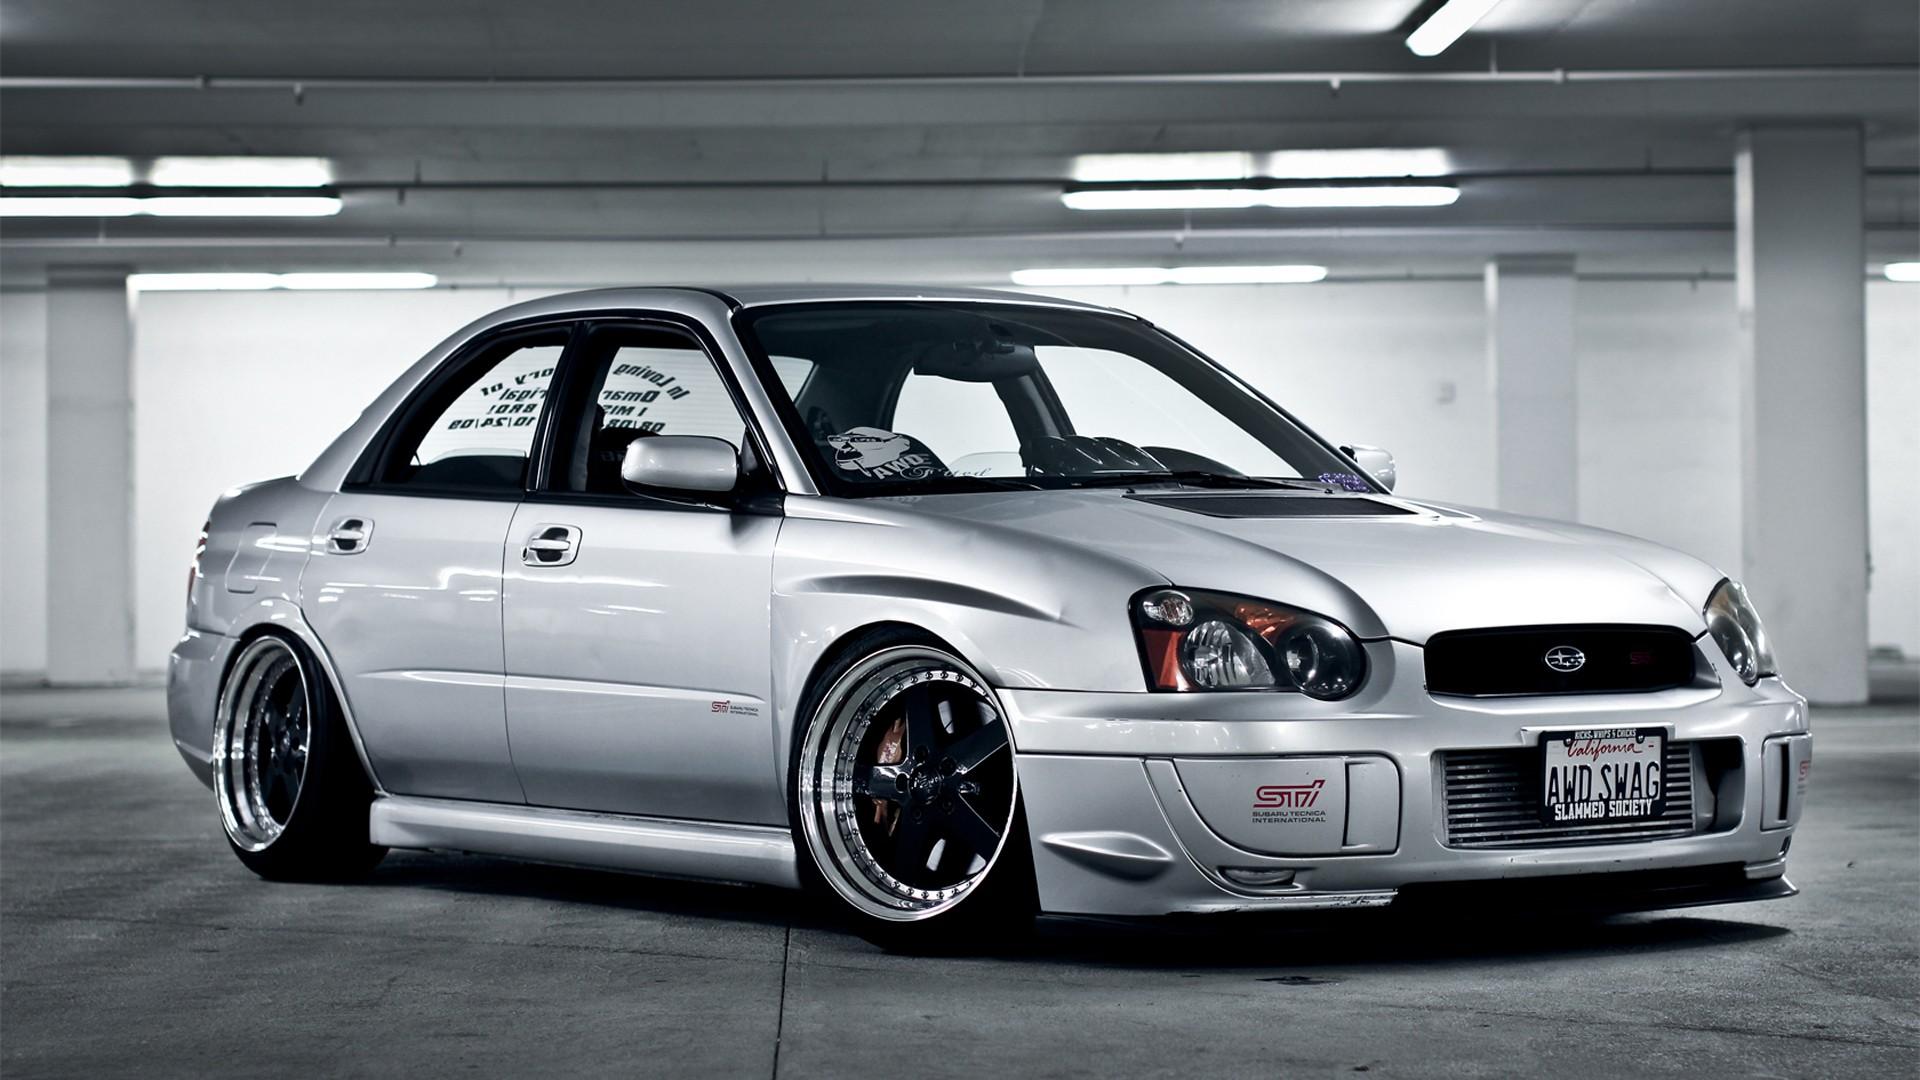 Subaru wrx jdm sti cars hd wallpaper - Subaru Car 25 Background Wallpaper Car Hd Wallpaper